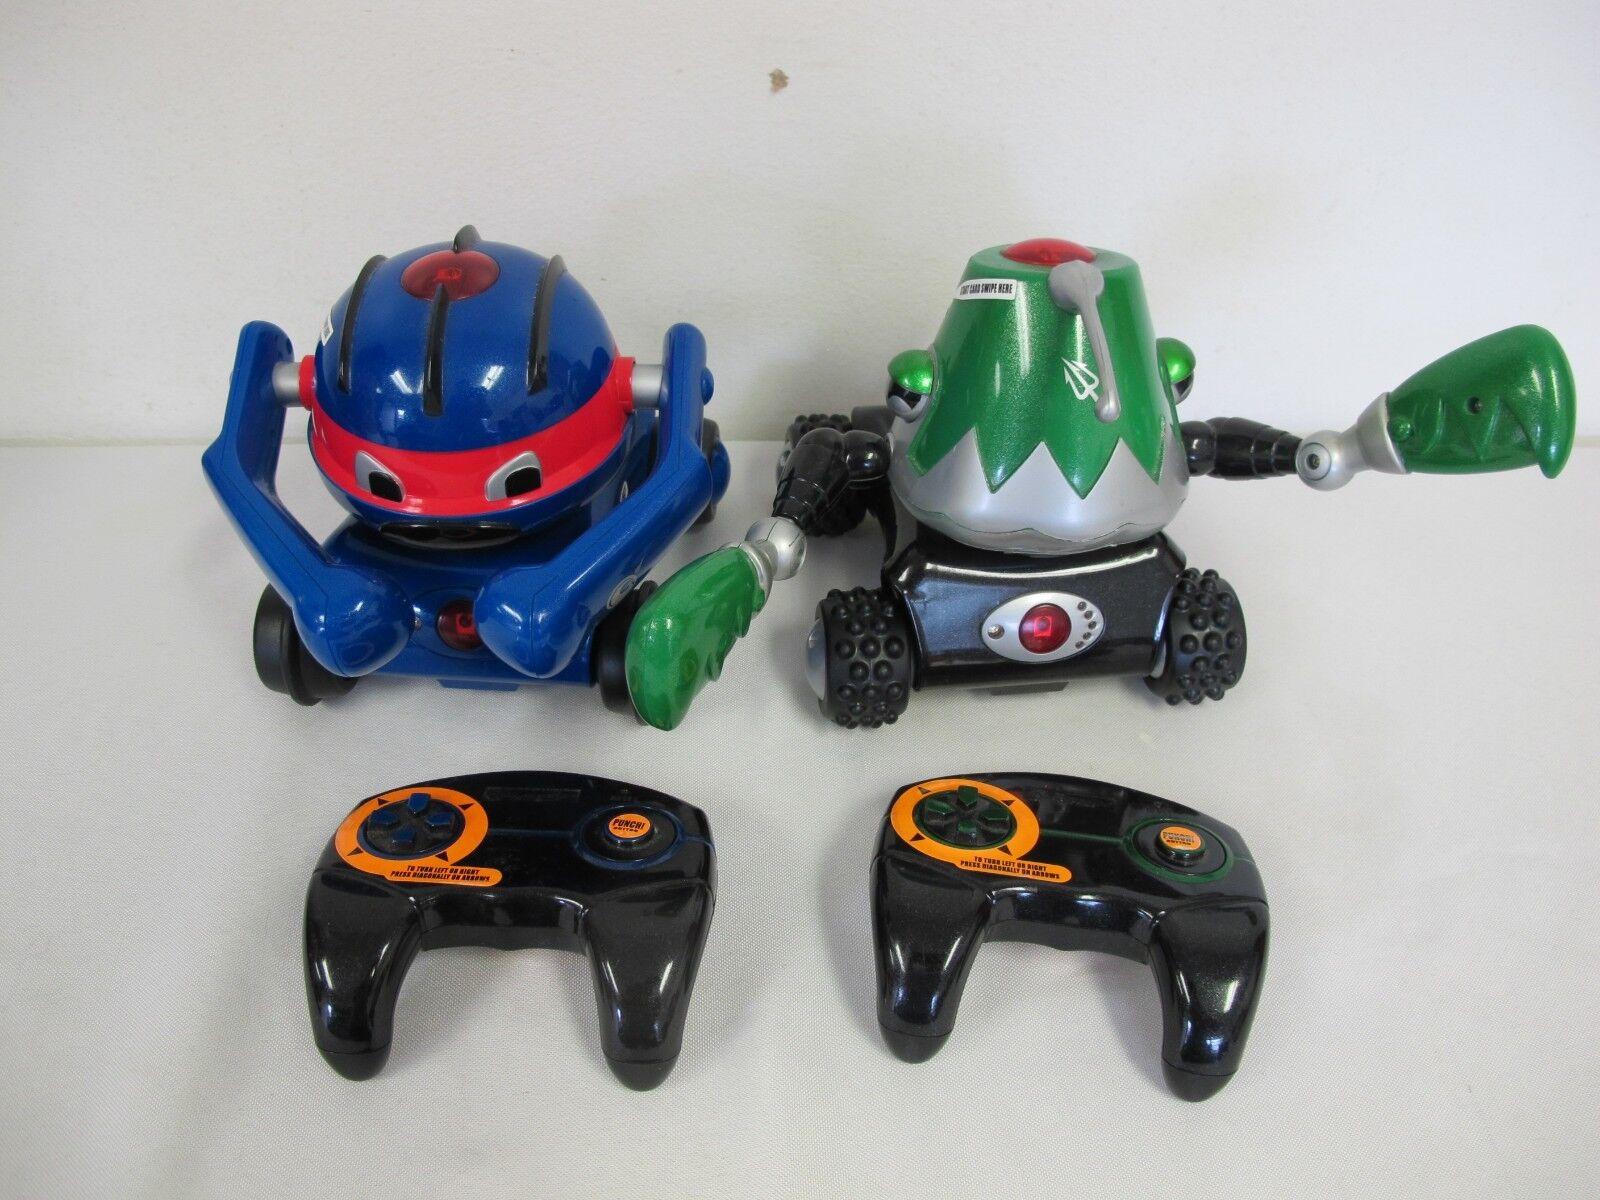 Kampf bot diamond series clamster & lobjaw 2000 trendmasters roboter